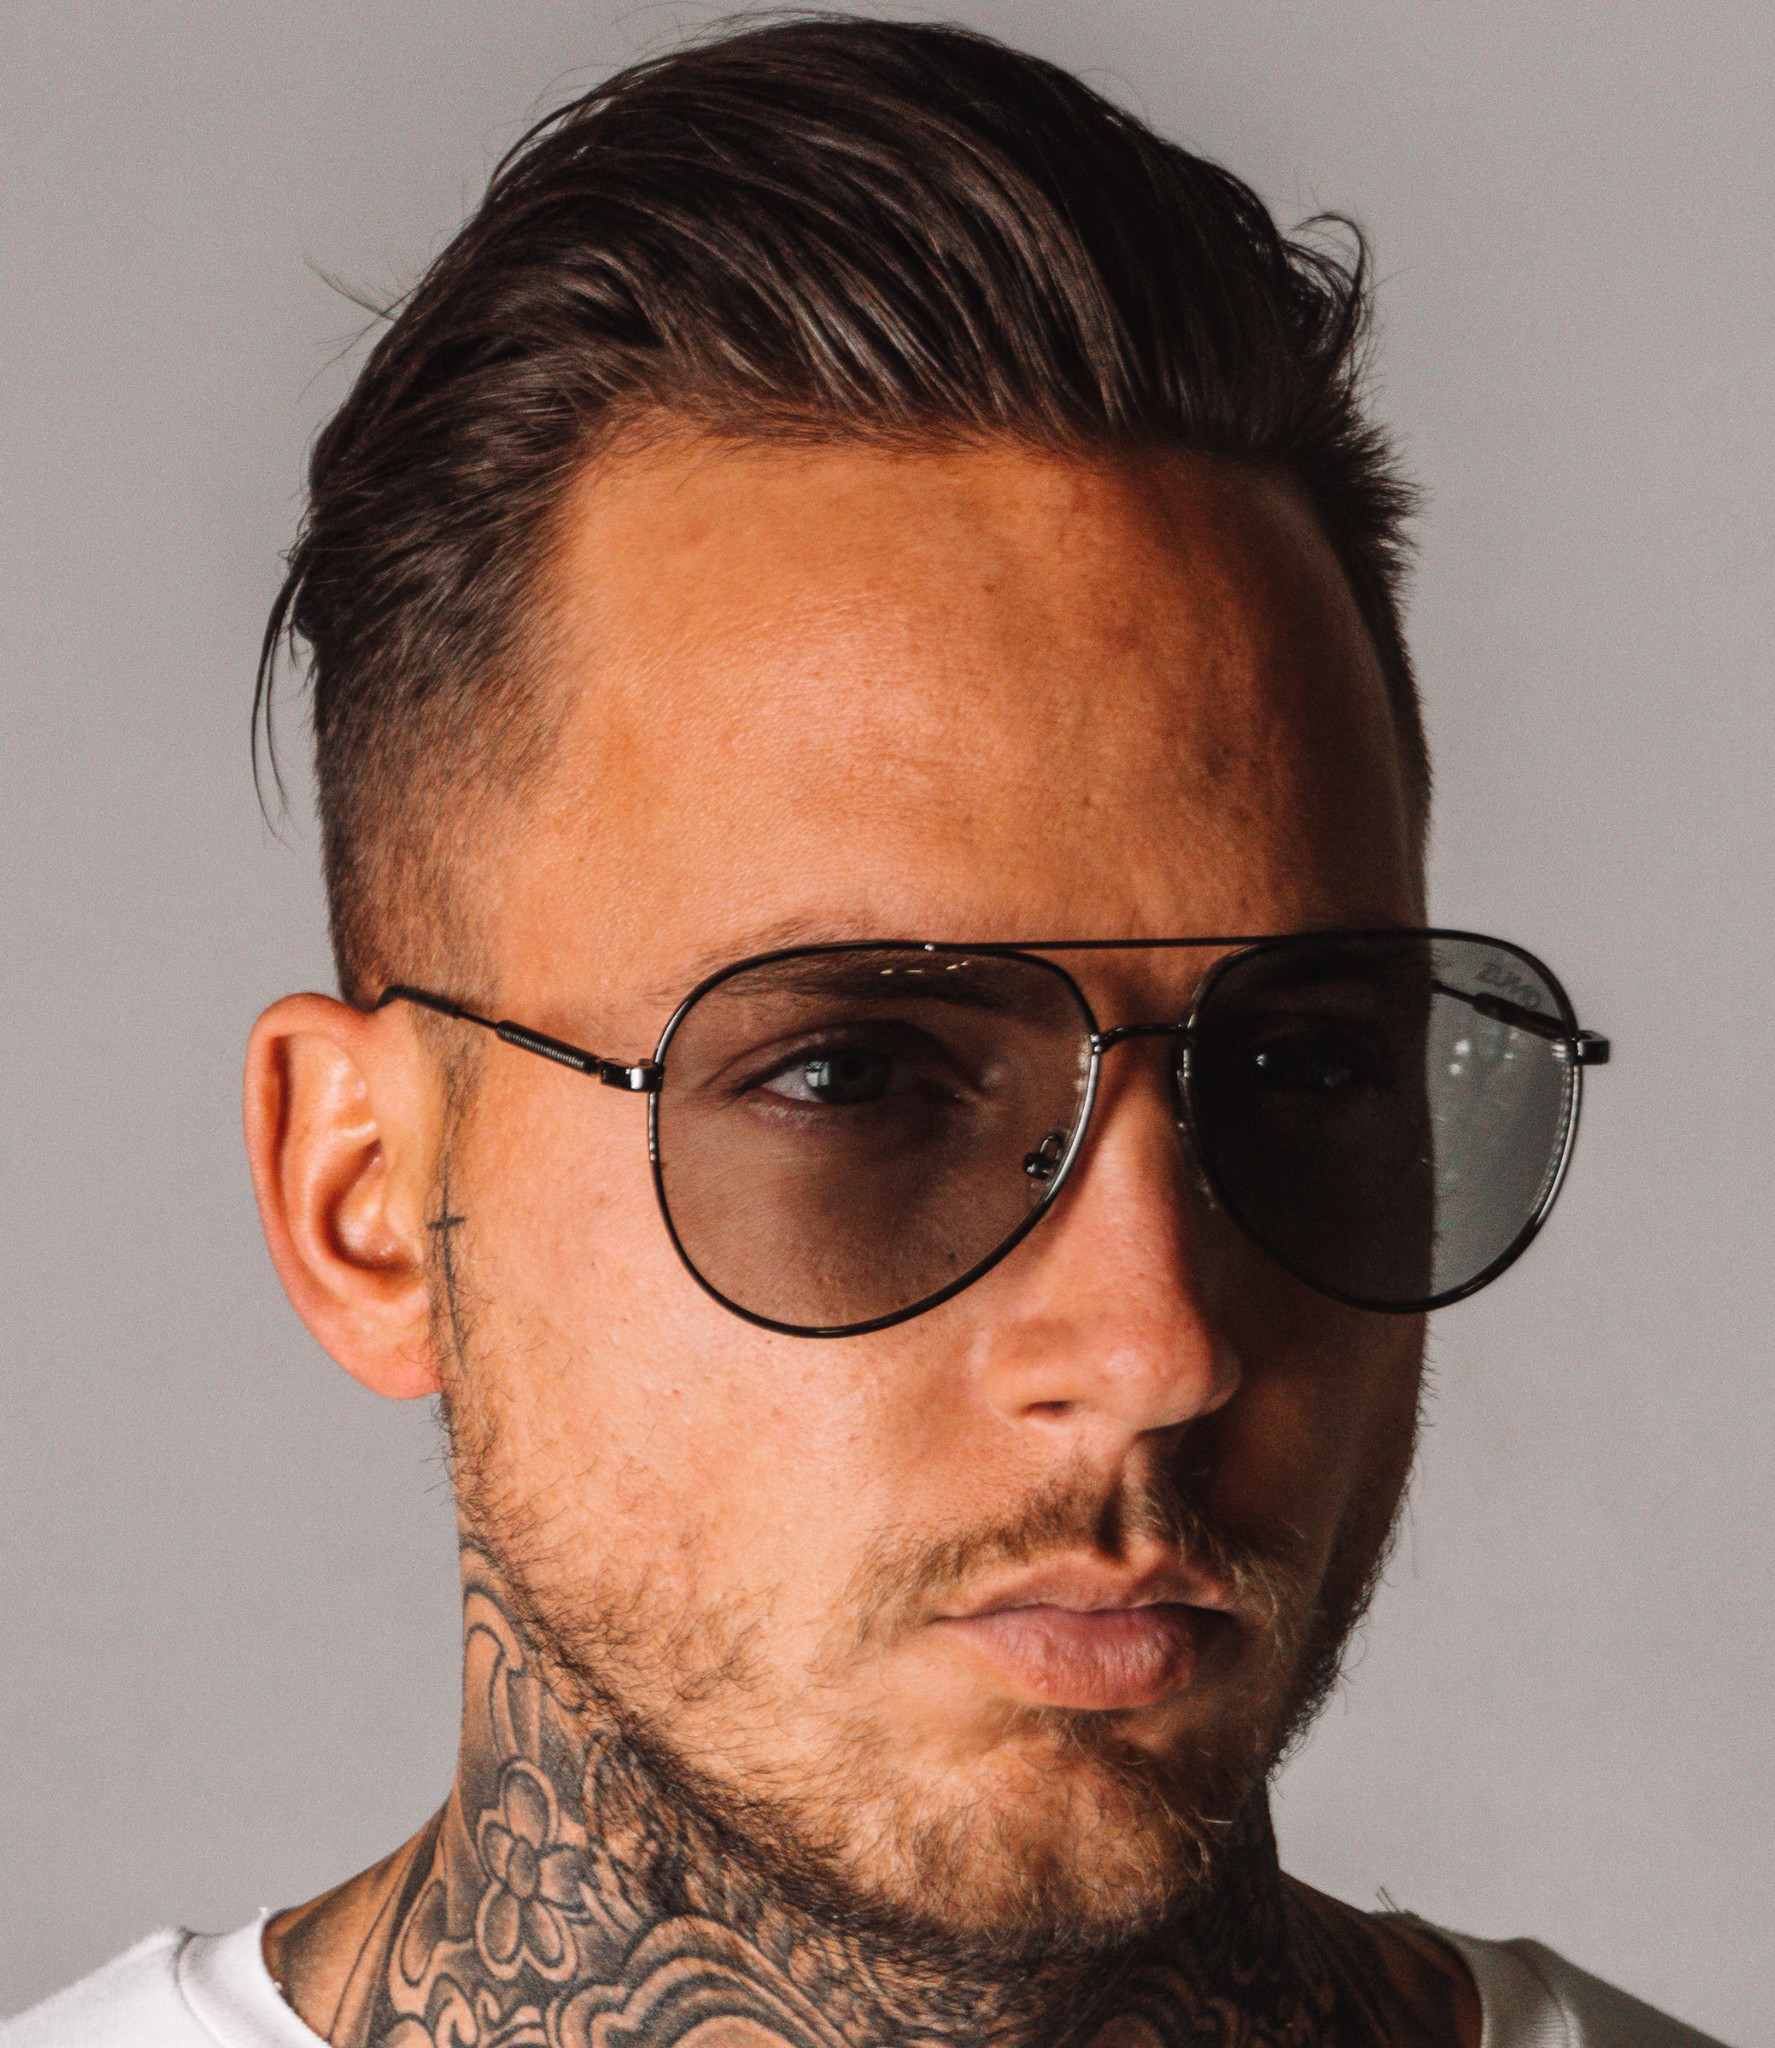 Zumo Sunglasses FUJI-QMWYS98171-C1 Black